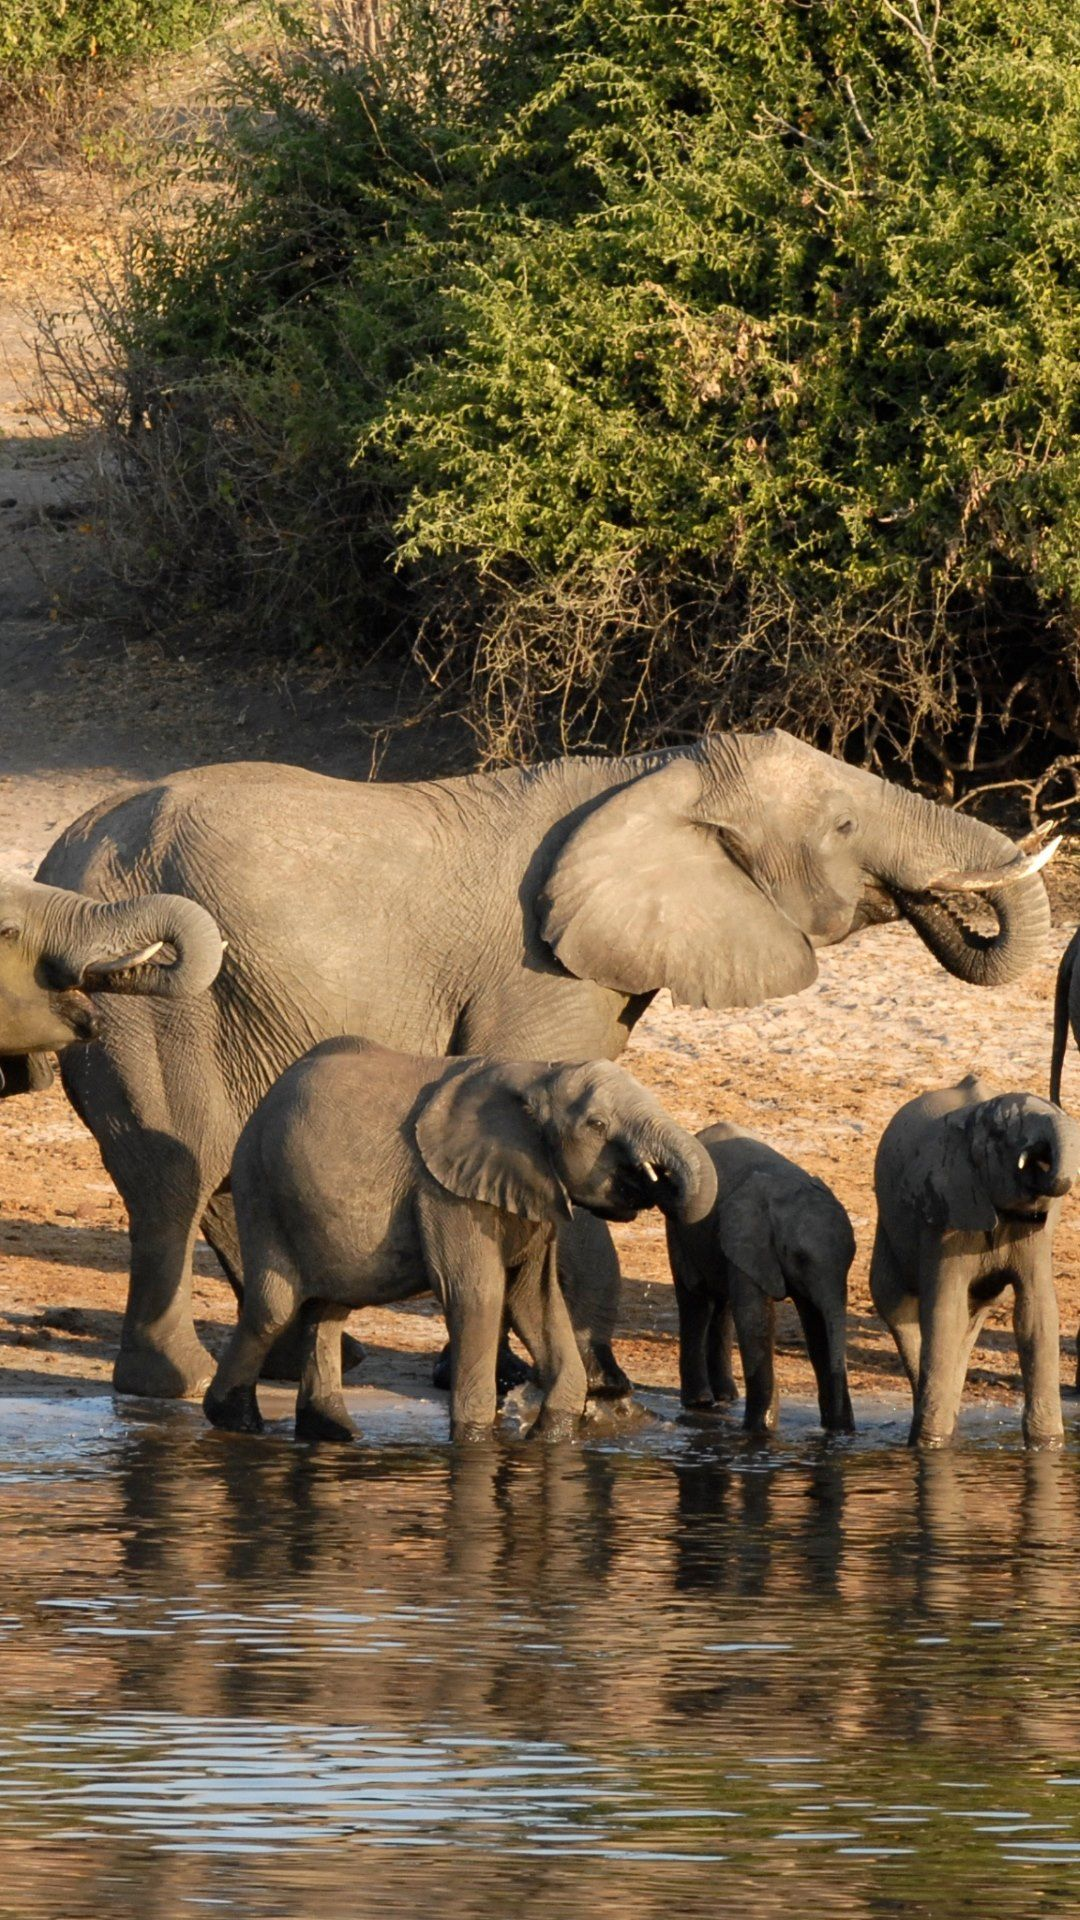 Cute Elephants Wallpaper Wallpapers Pinterest Elephant